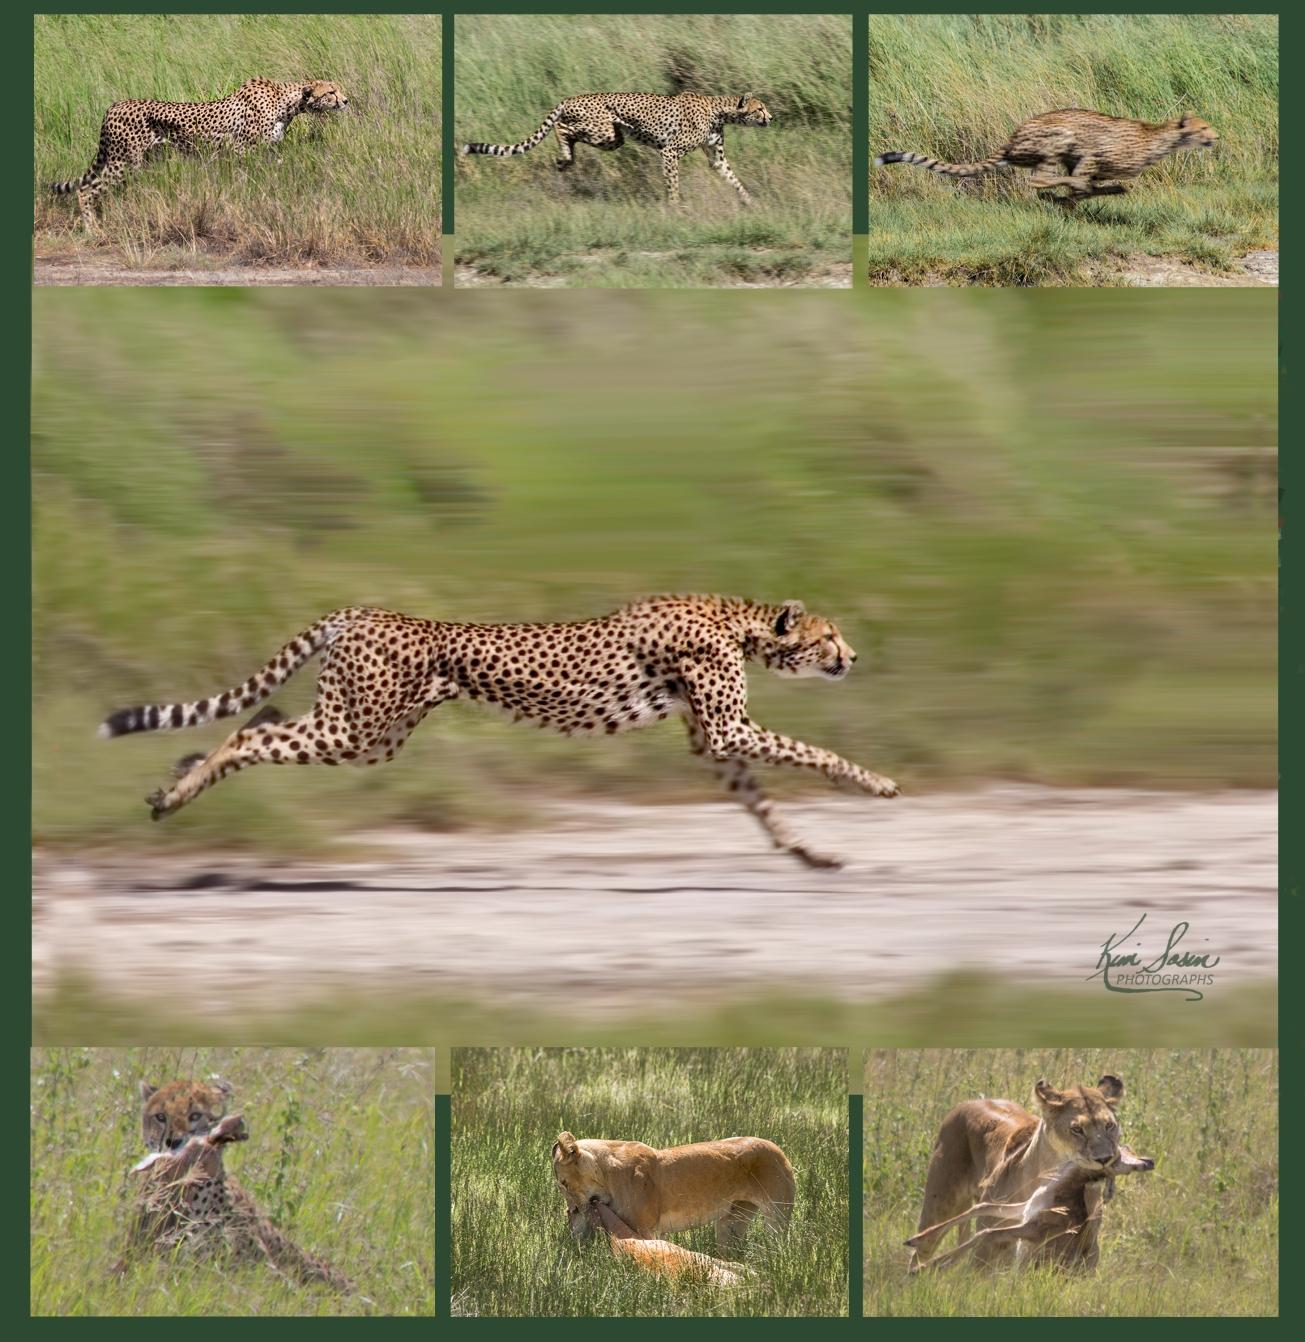 CheetahandLioness_KimSosin